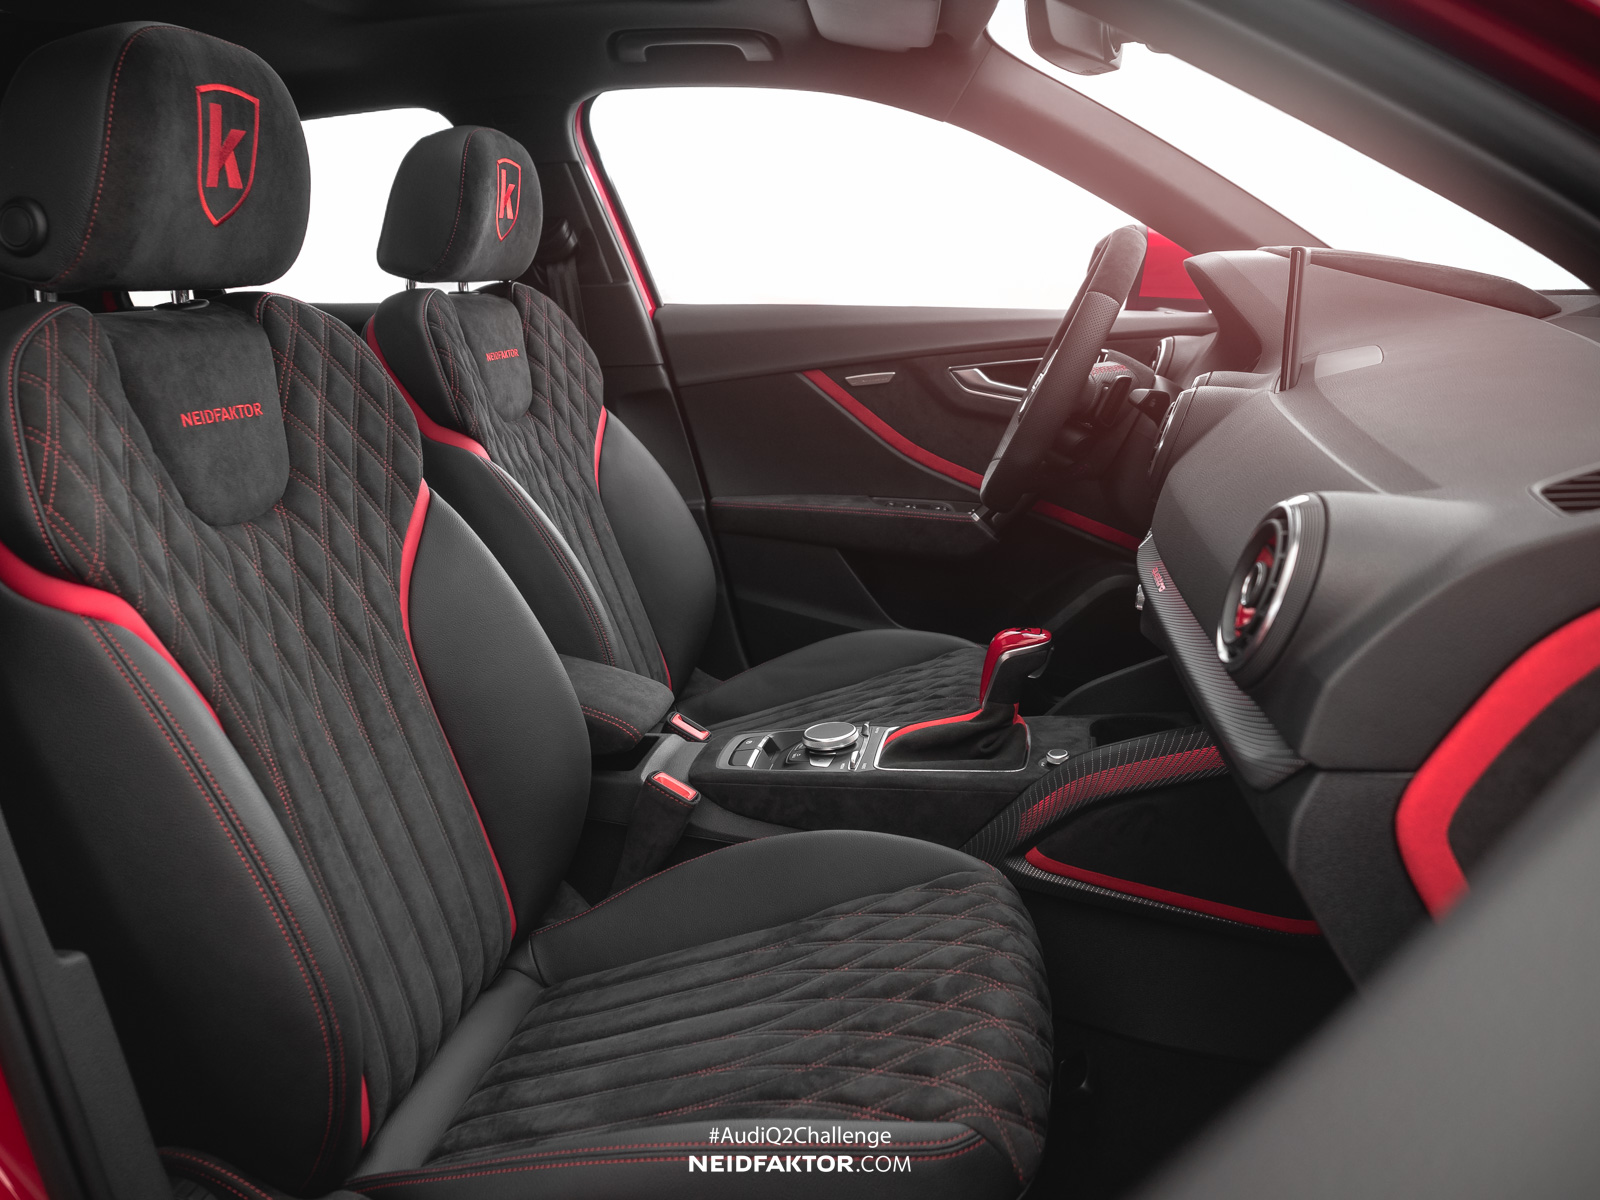 Audi Q2 Gets Interior Overhaul Thanks To Neidfaktor